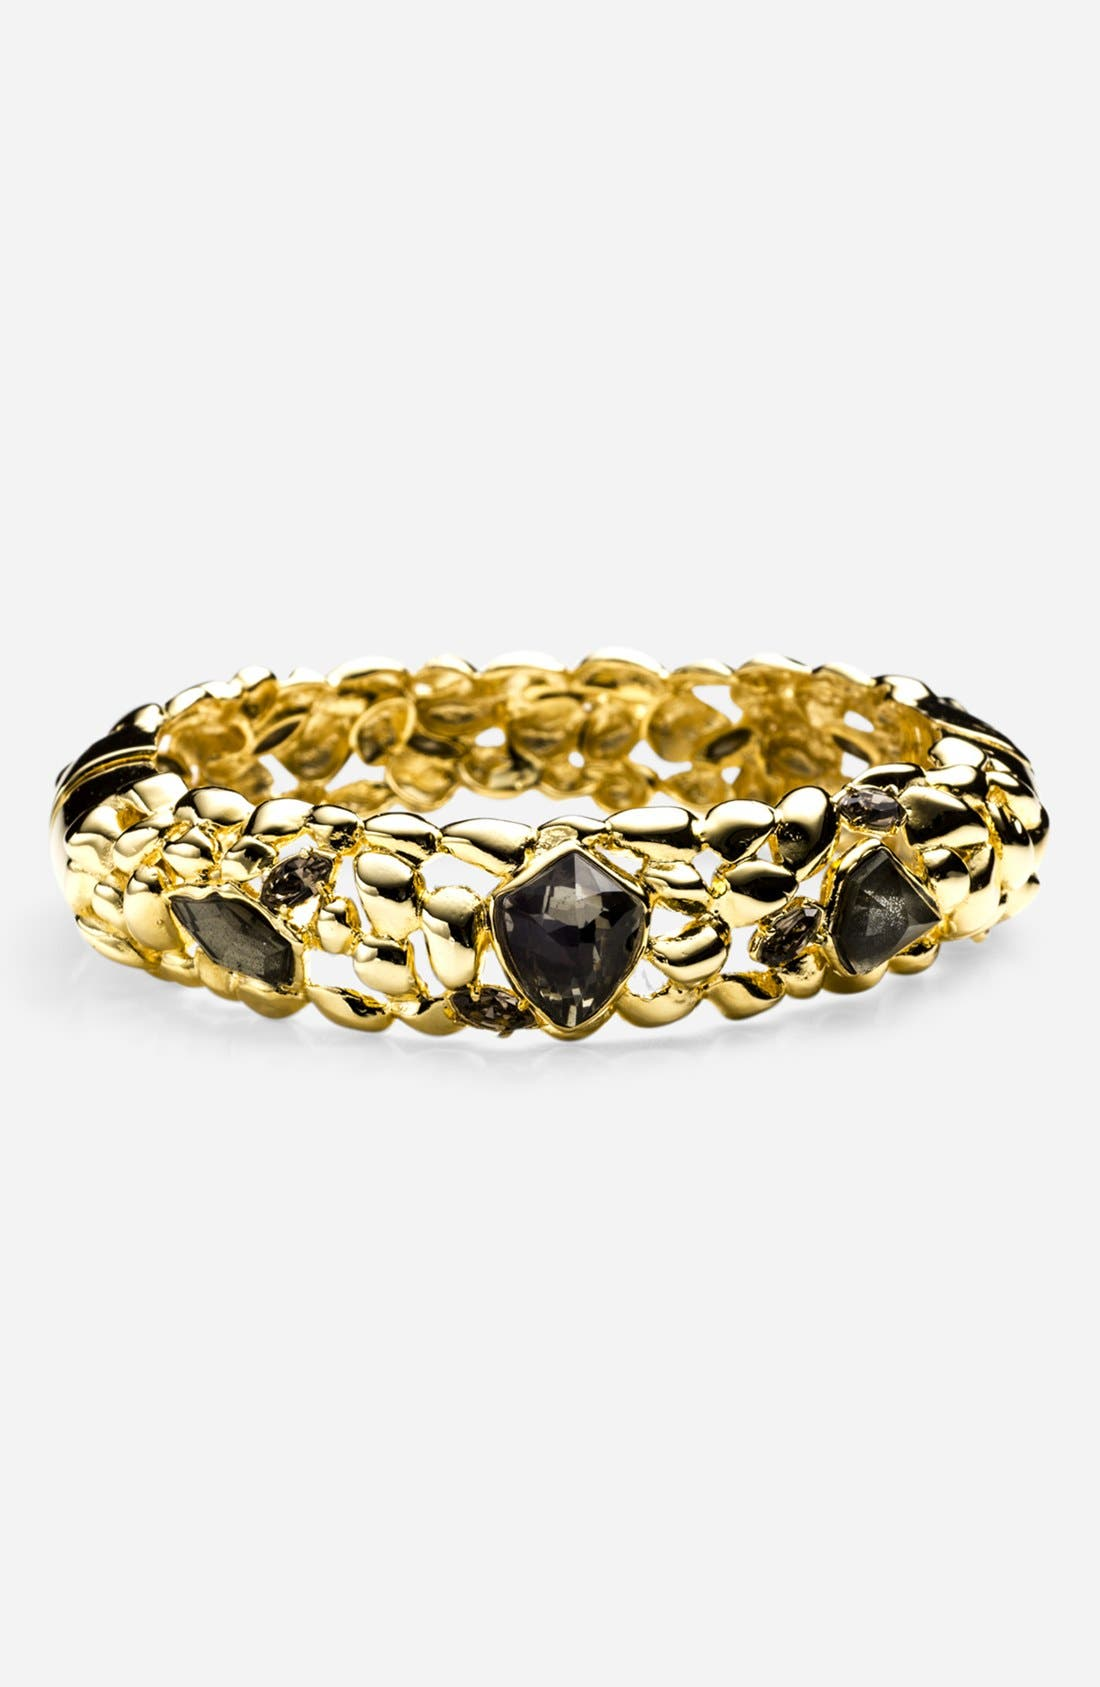 Alternate Image 1 Selected - Alexis Bittar 'Miss Havisham' Hinged Bracelet